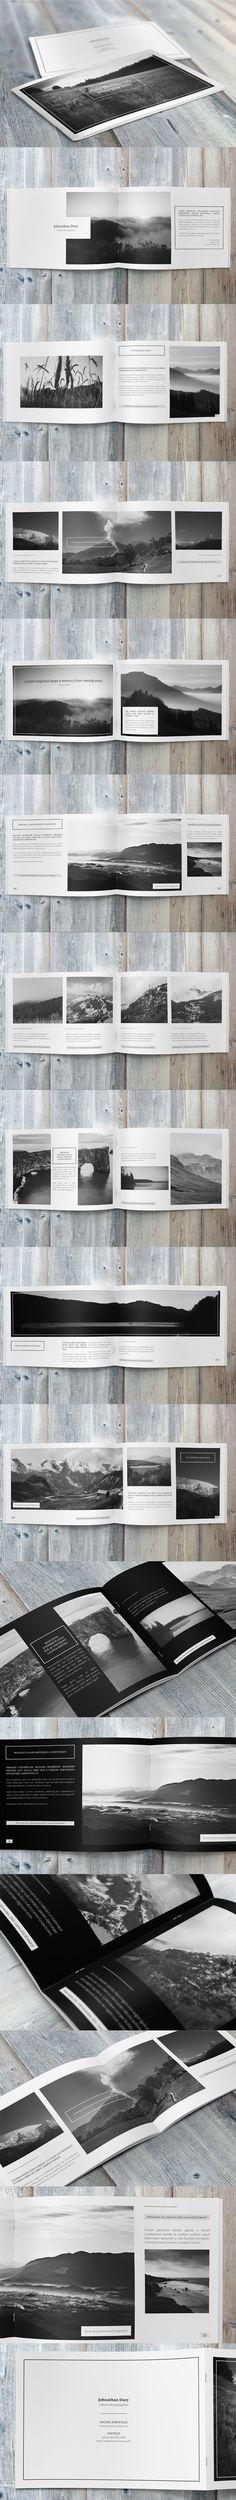 Minimalfolio Photography Portfolio A4 Brochure on Behance